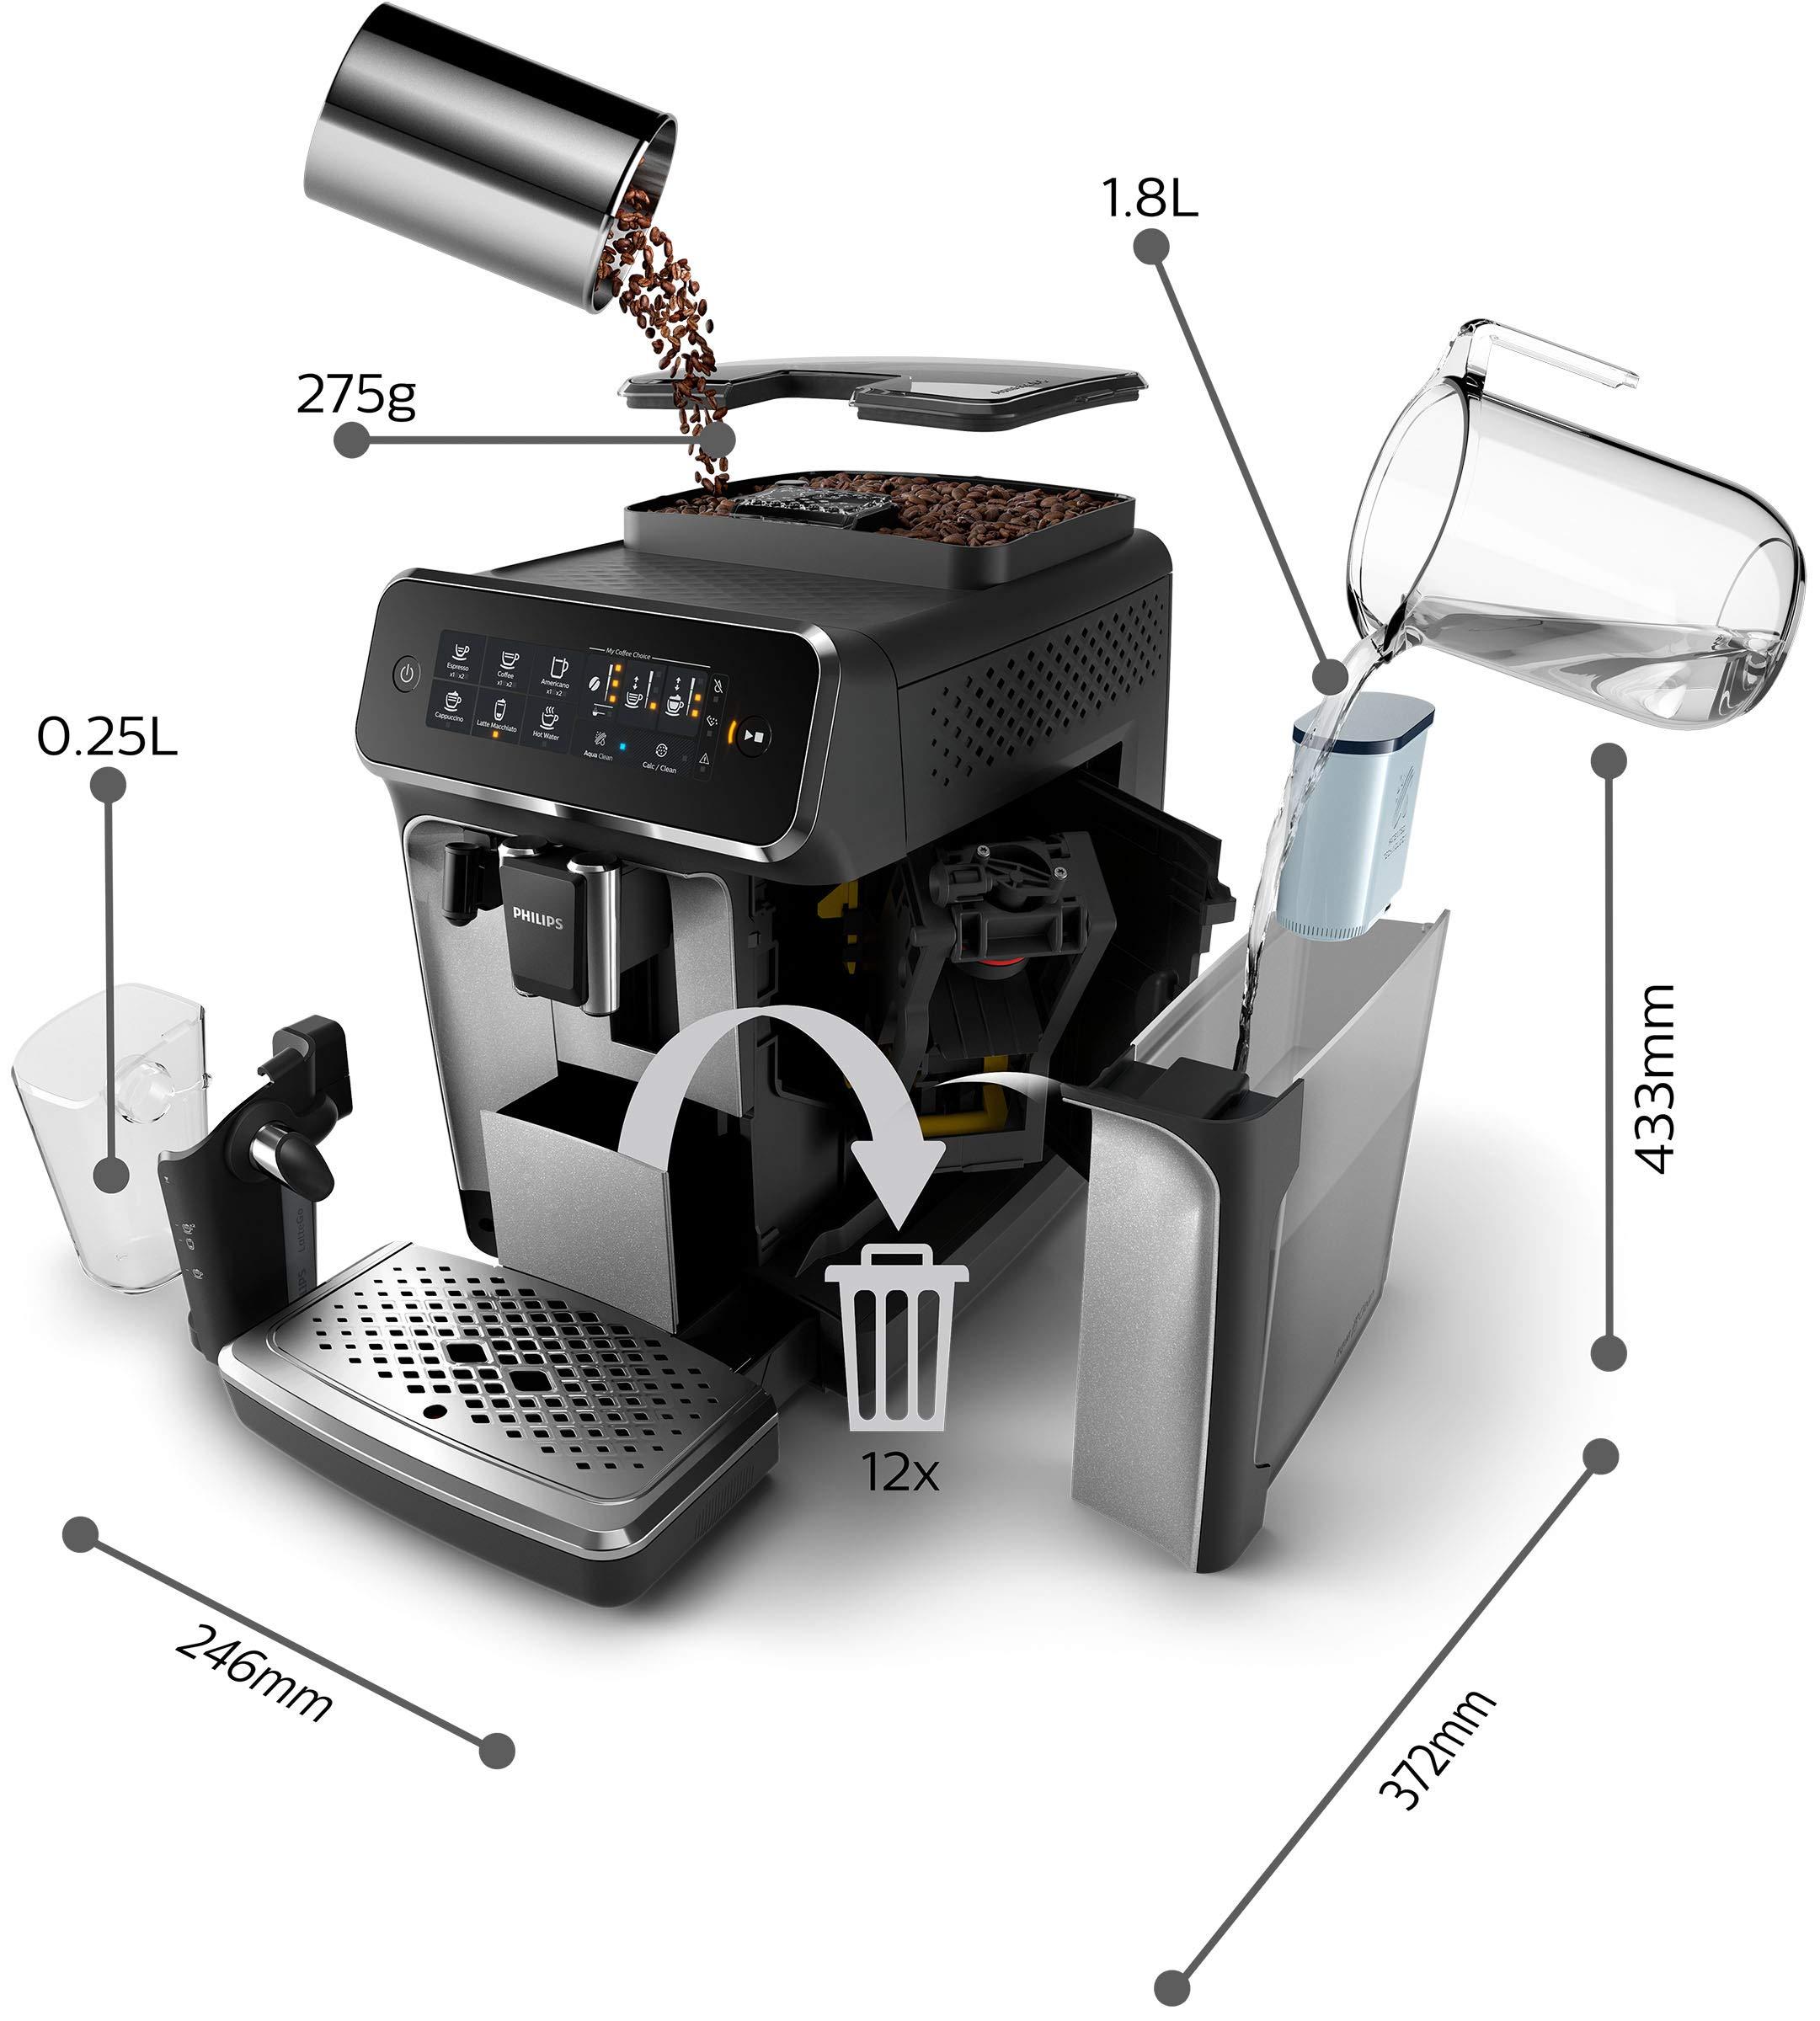 Philips-3200-Serie-EP324670-Kaffeevollautomat-LatteGo-Milchsystem-schwarzsilber-lackiert